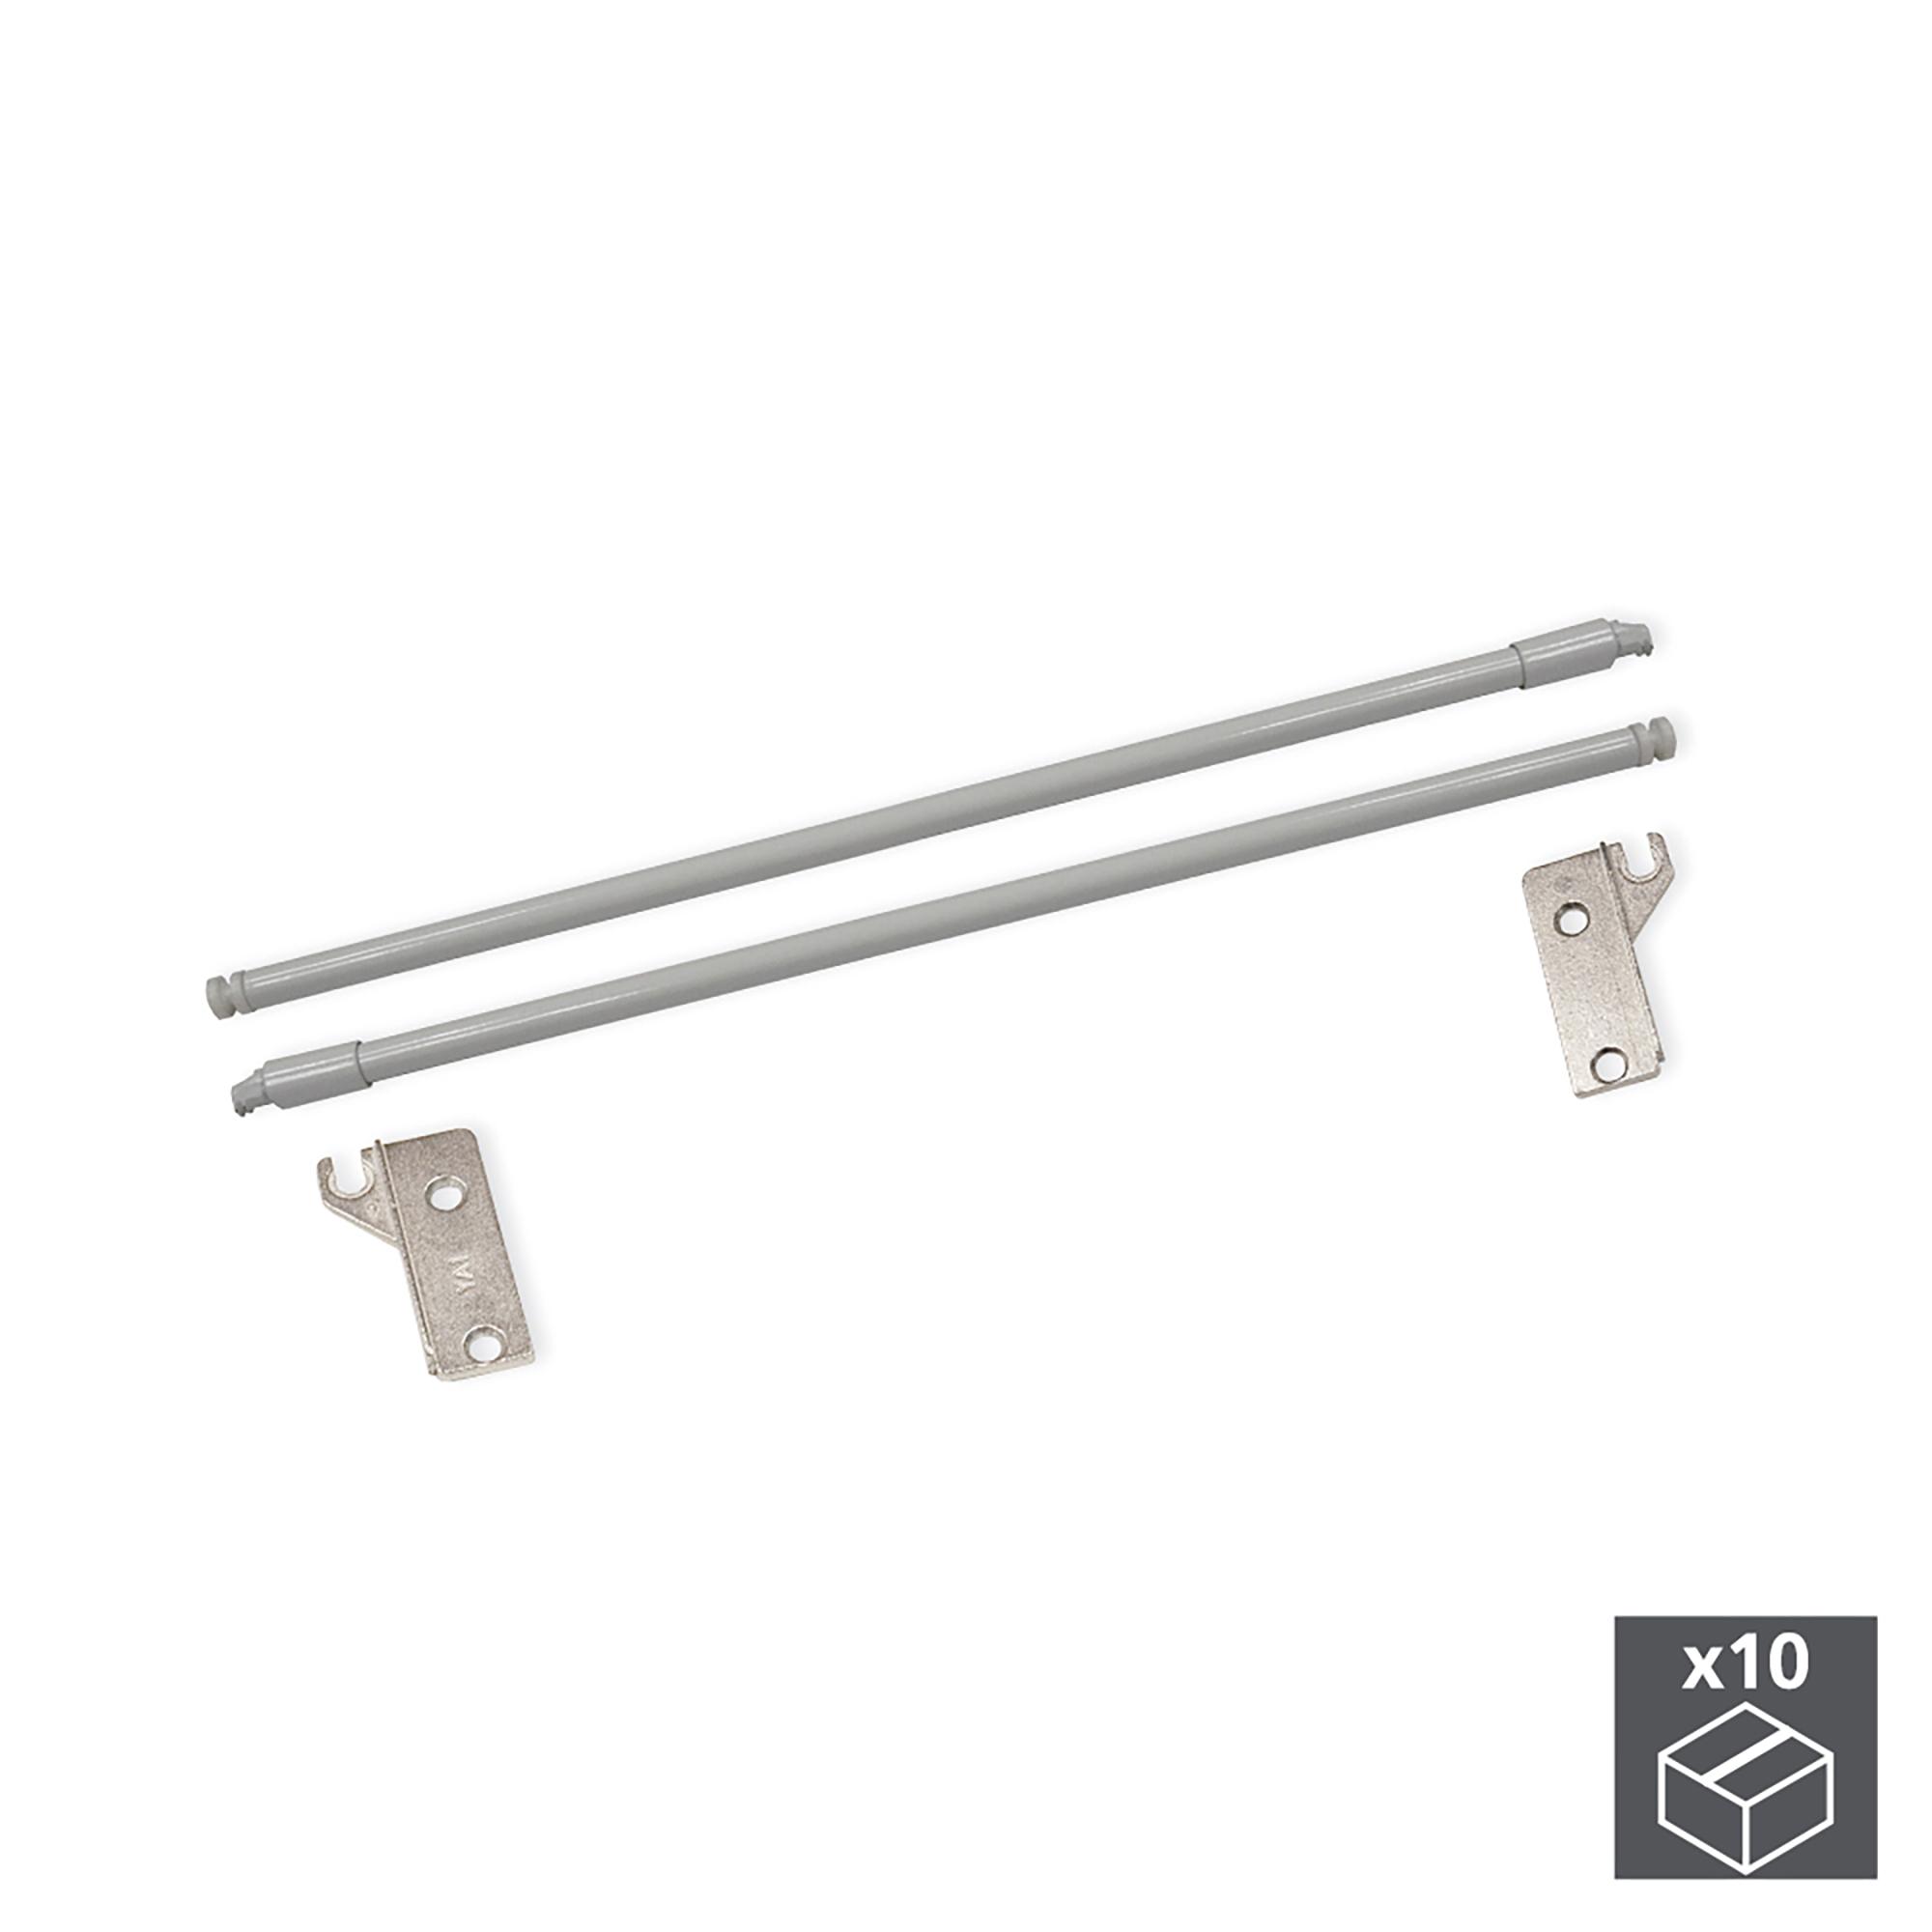 Emuca Kit Astine per cassetti Ultrabox, D. 10 mm, Prof. 450 mm, Acciaio, Grigio metallizzato, 10 u.